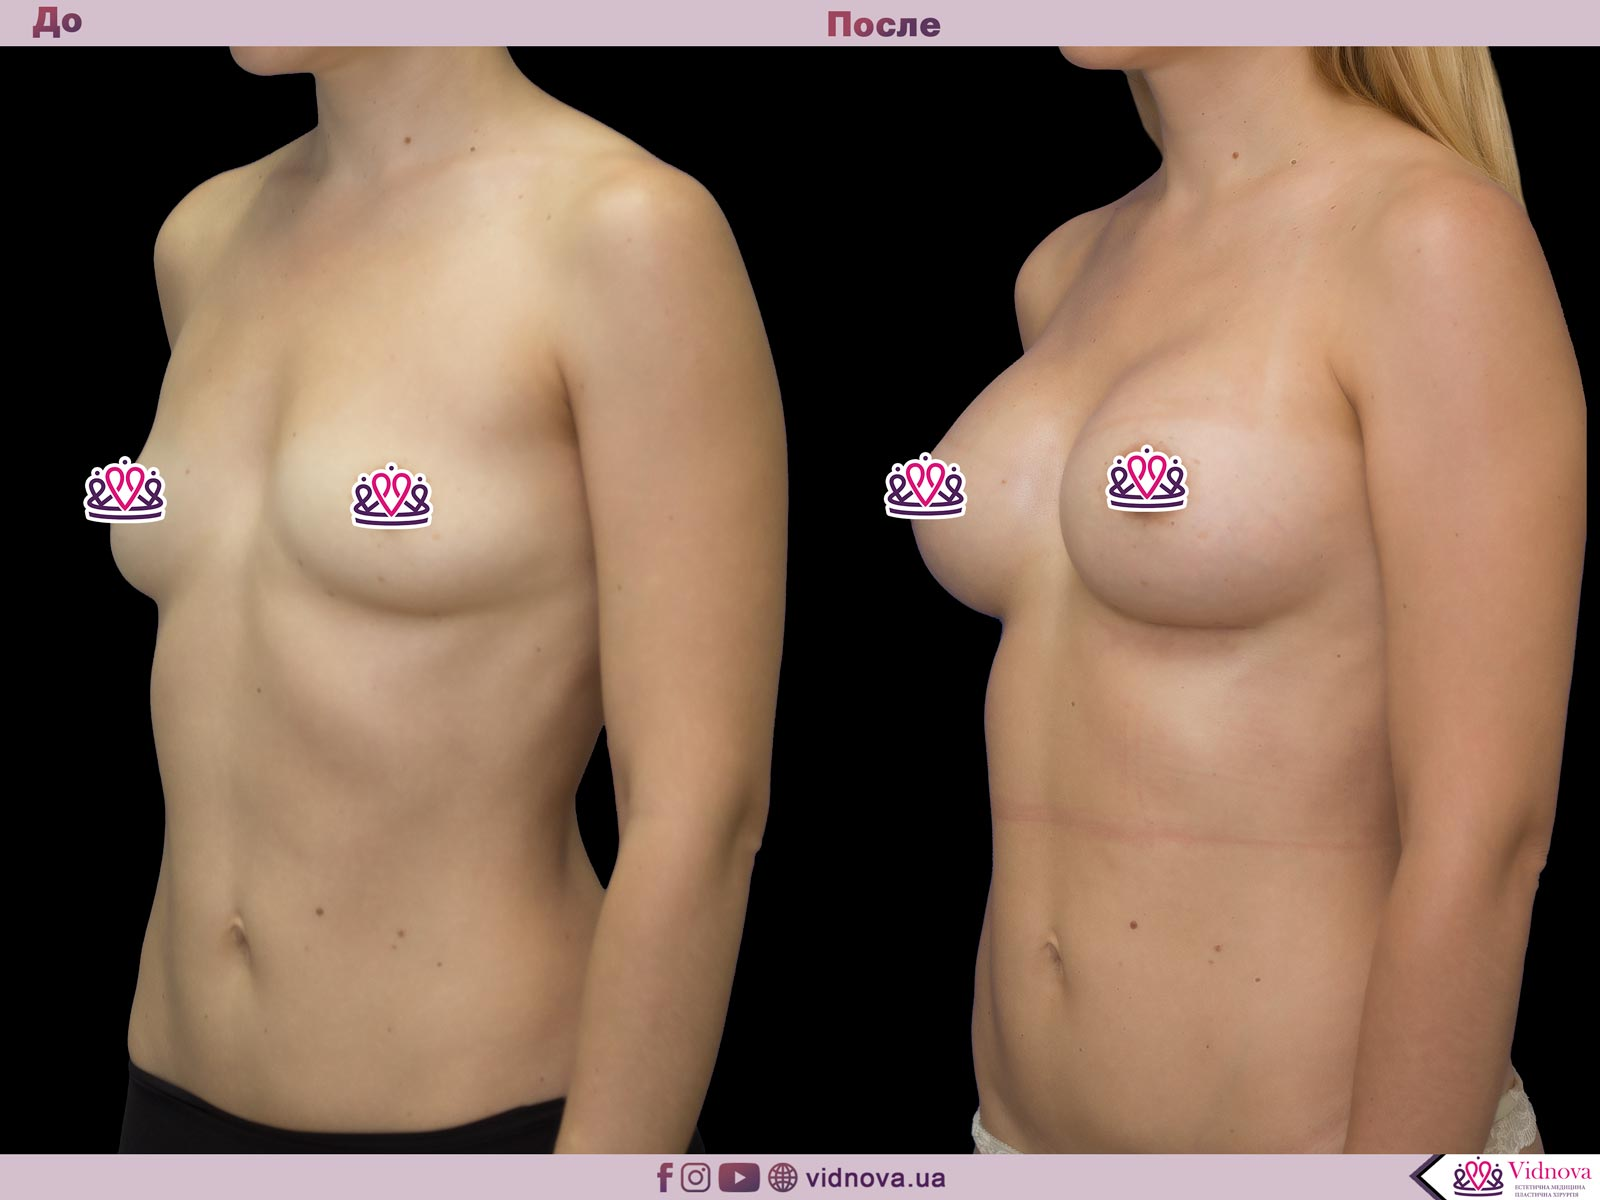 Увеличение груди: Фото ДО и ПОСЛЕ - Пример №54-2 - Клиника Vidnova